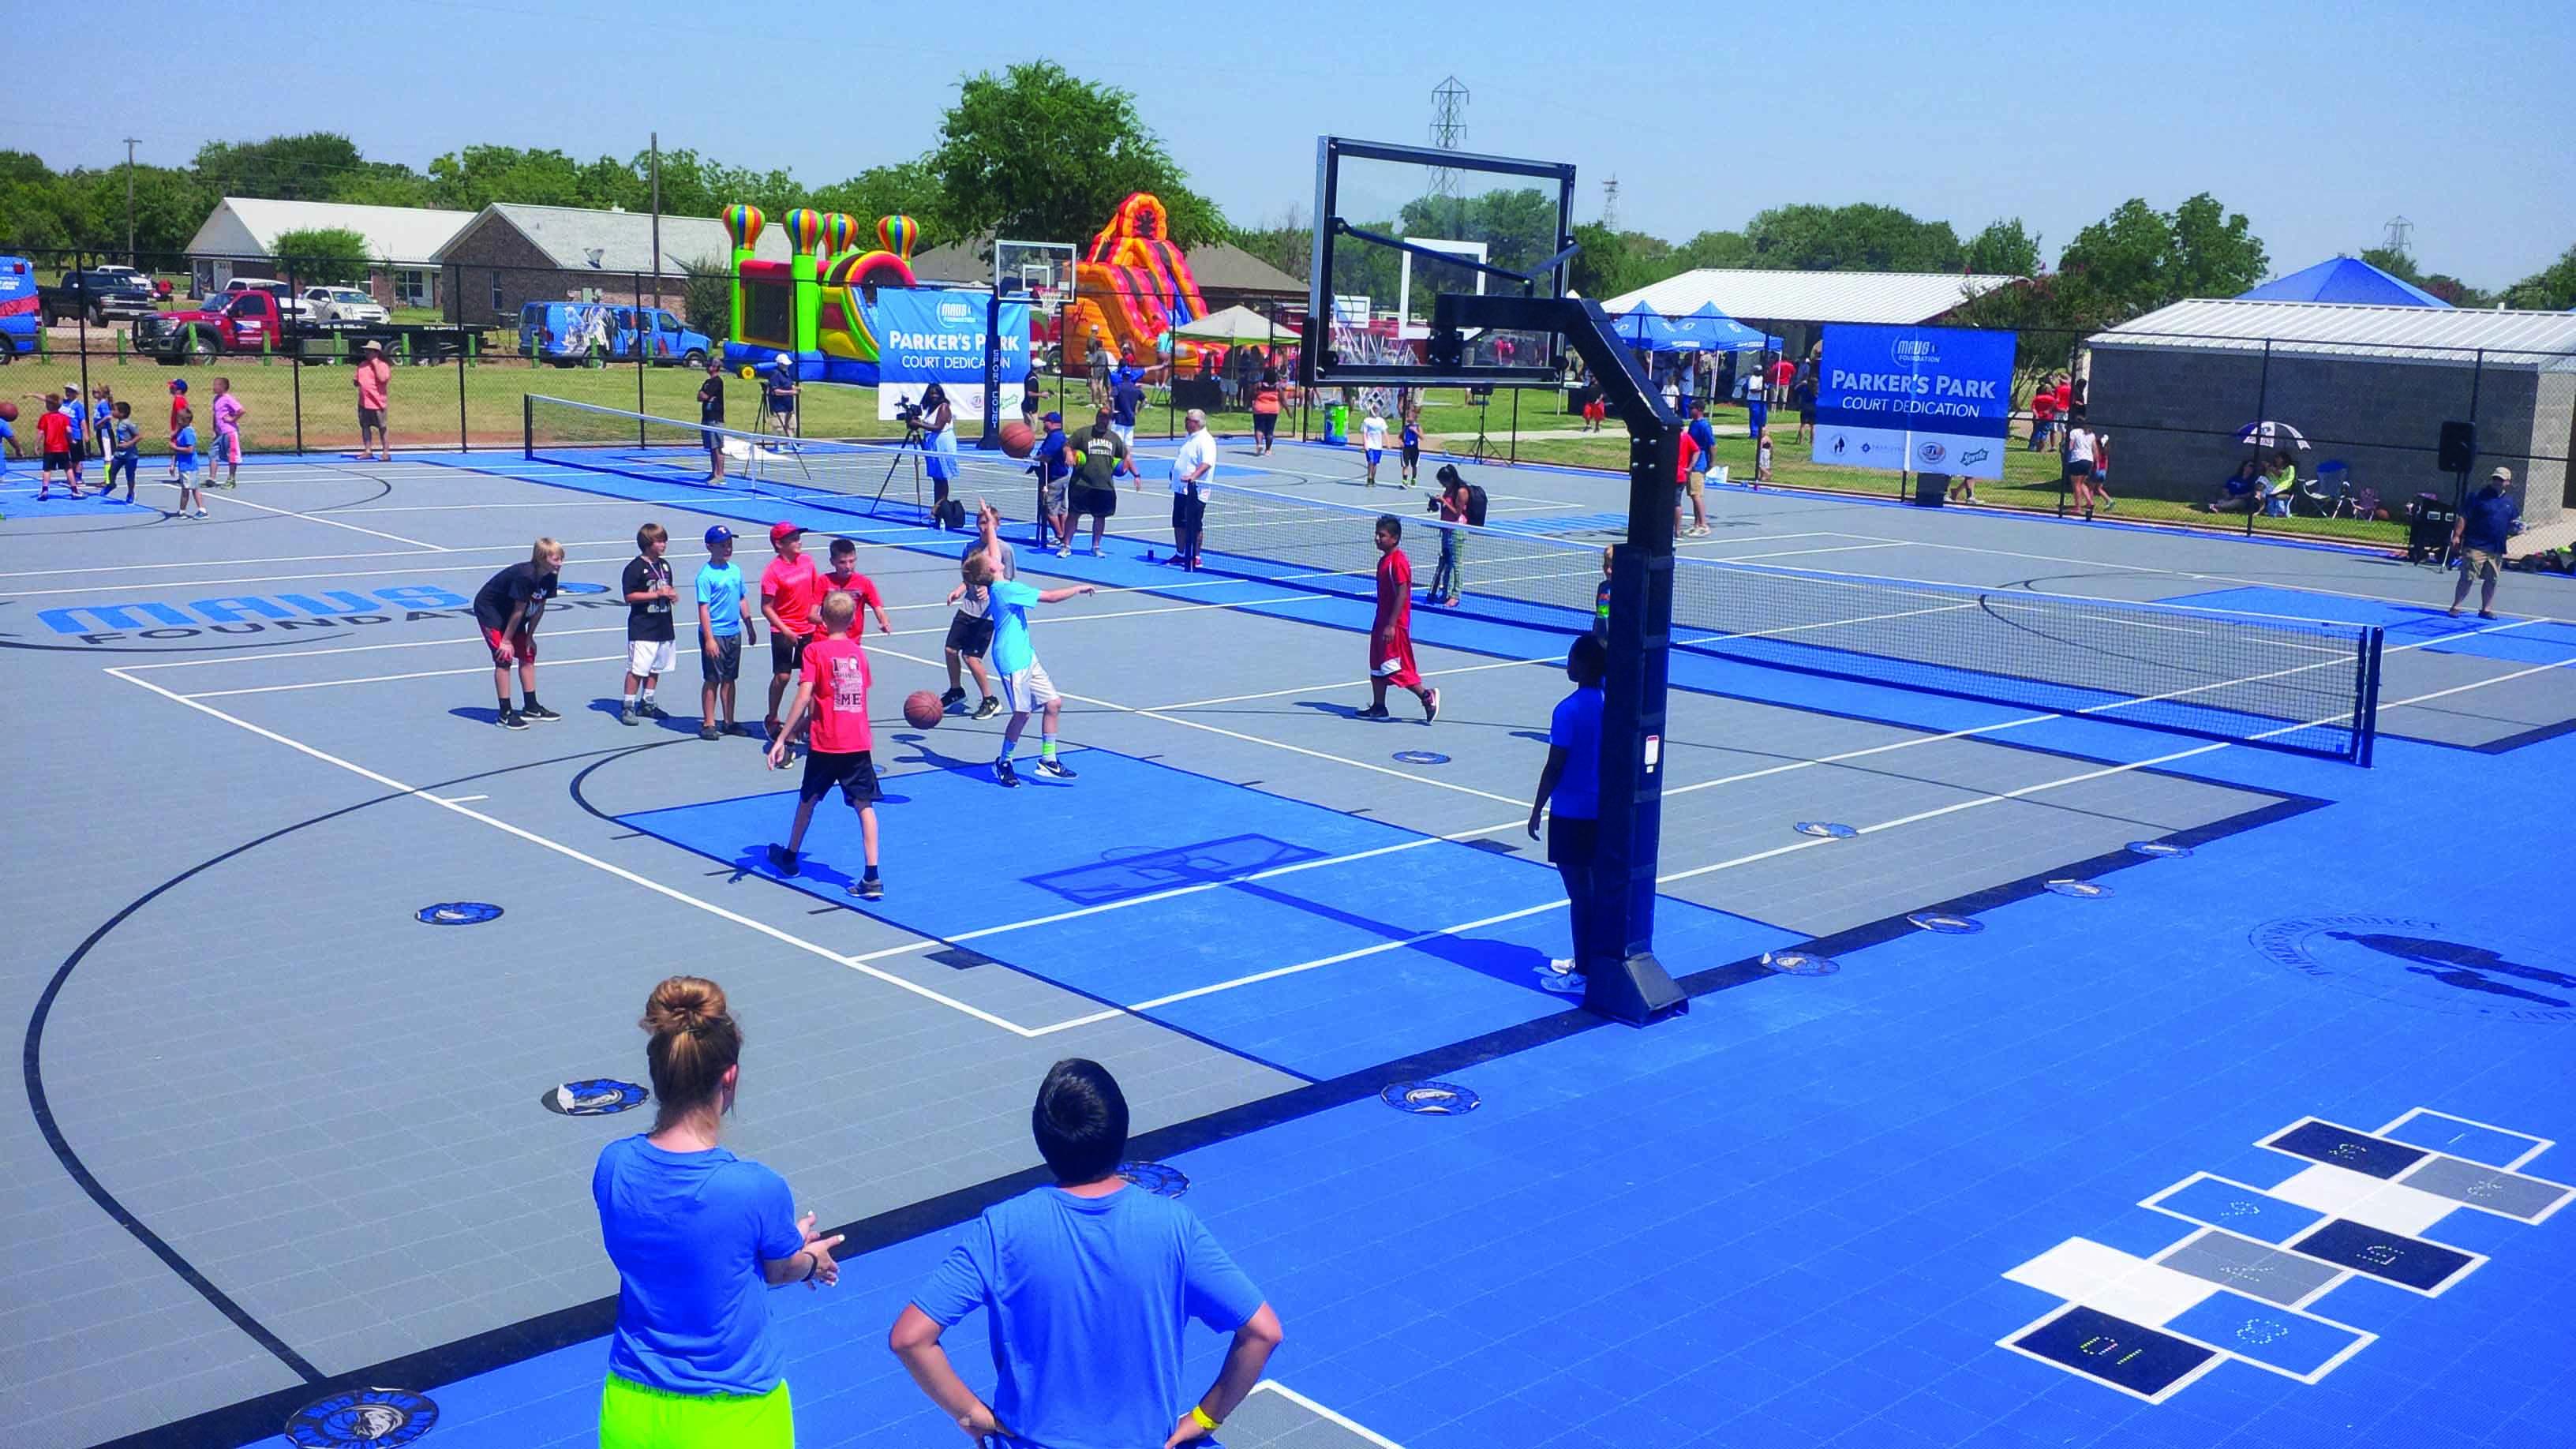 Parks Recreation Facilities Sport Court Sport Court Facility Sports